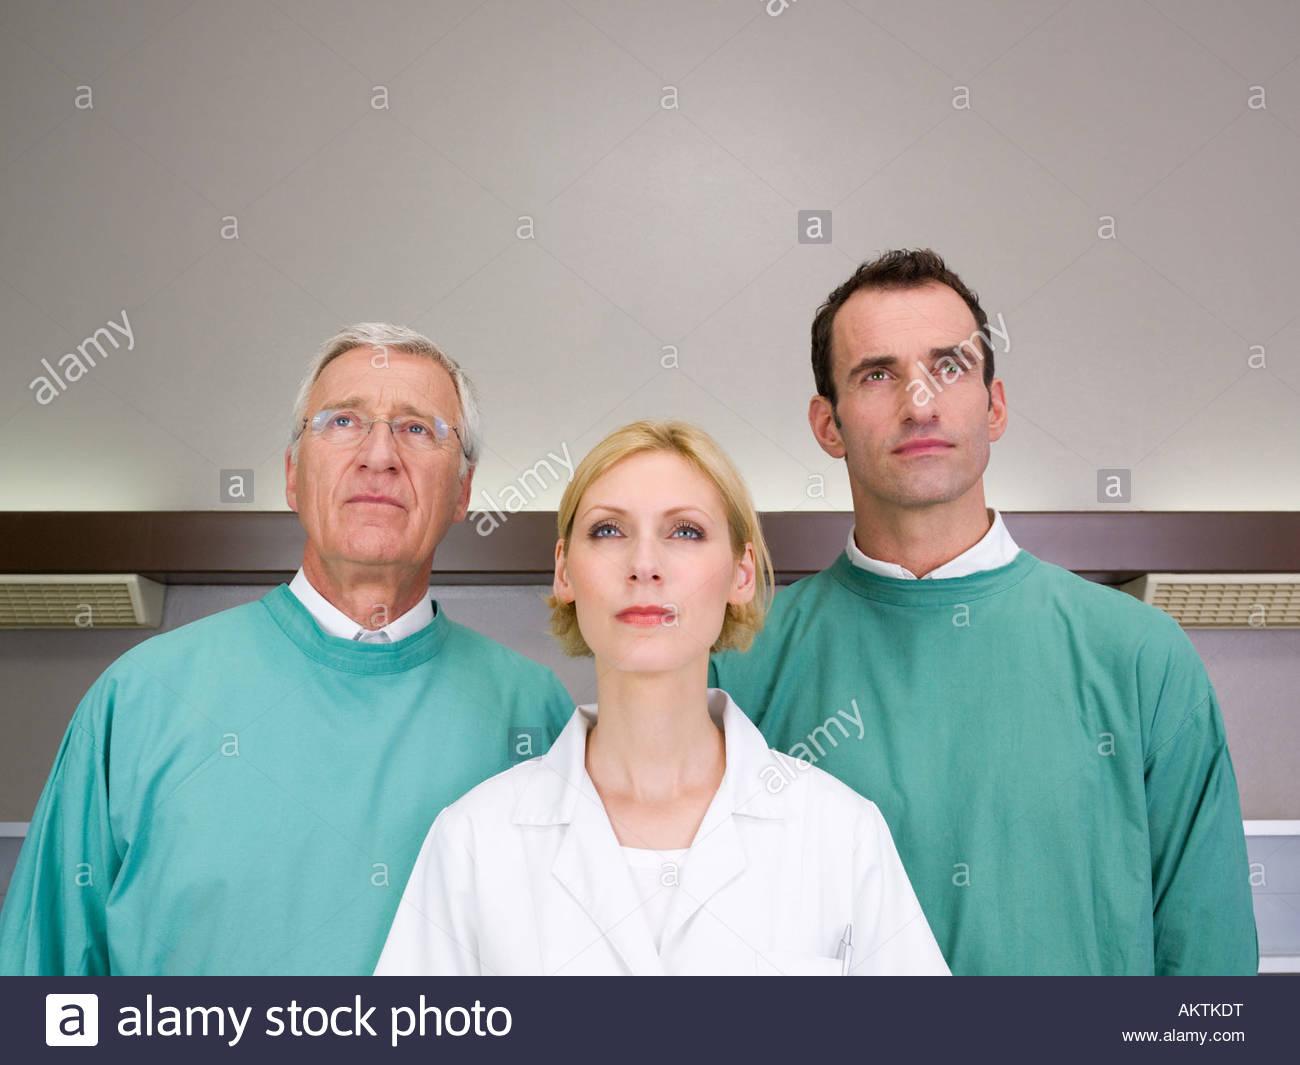 Portrait of hospital staff - Stock Image